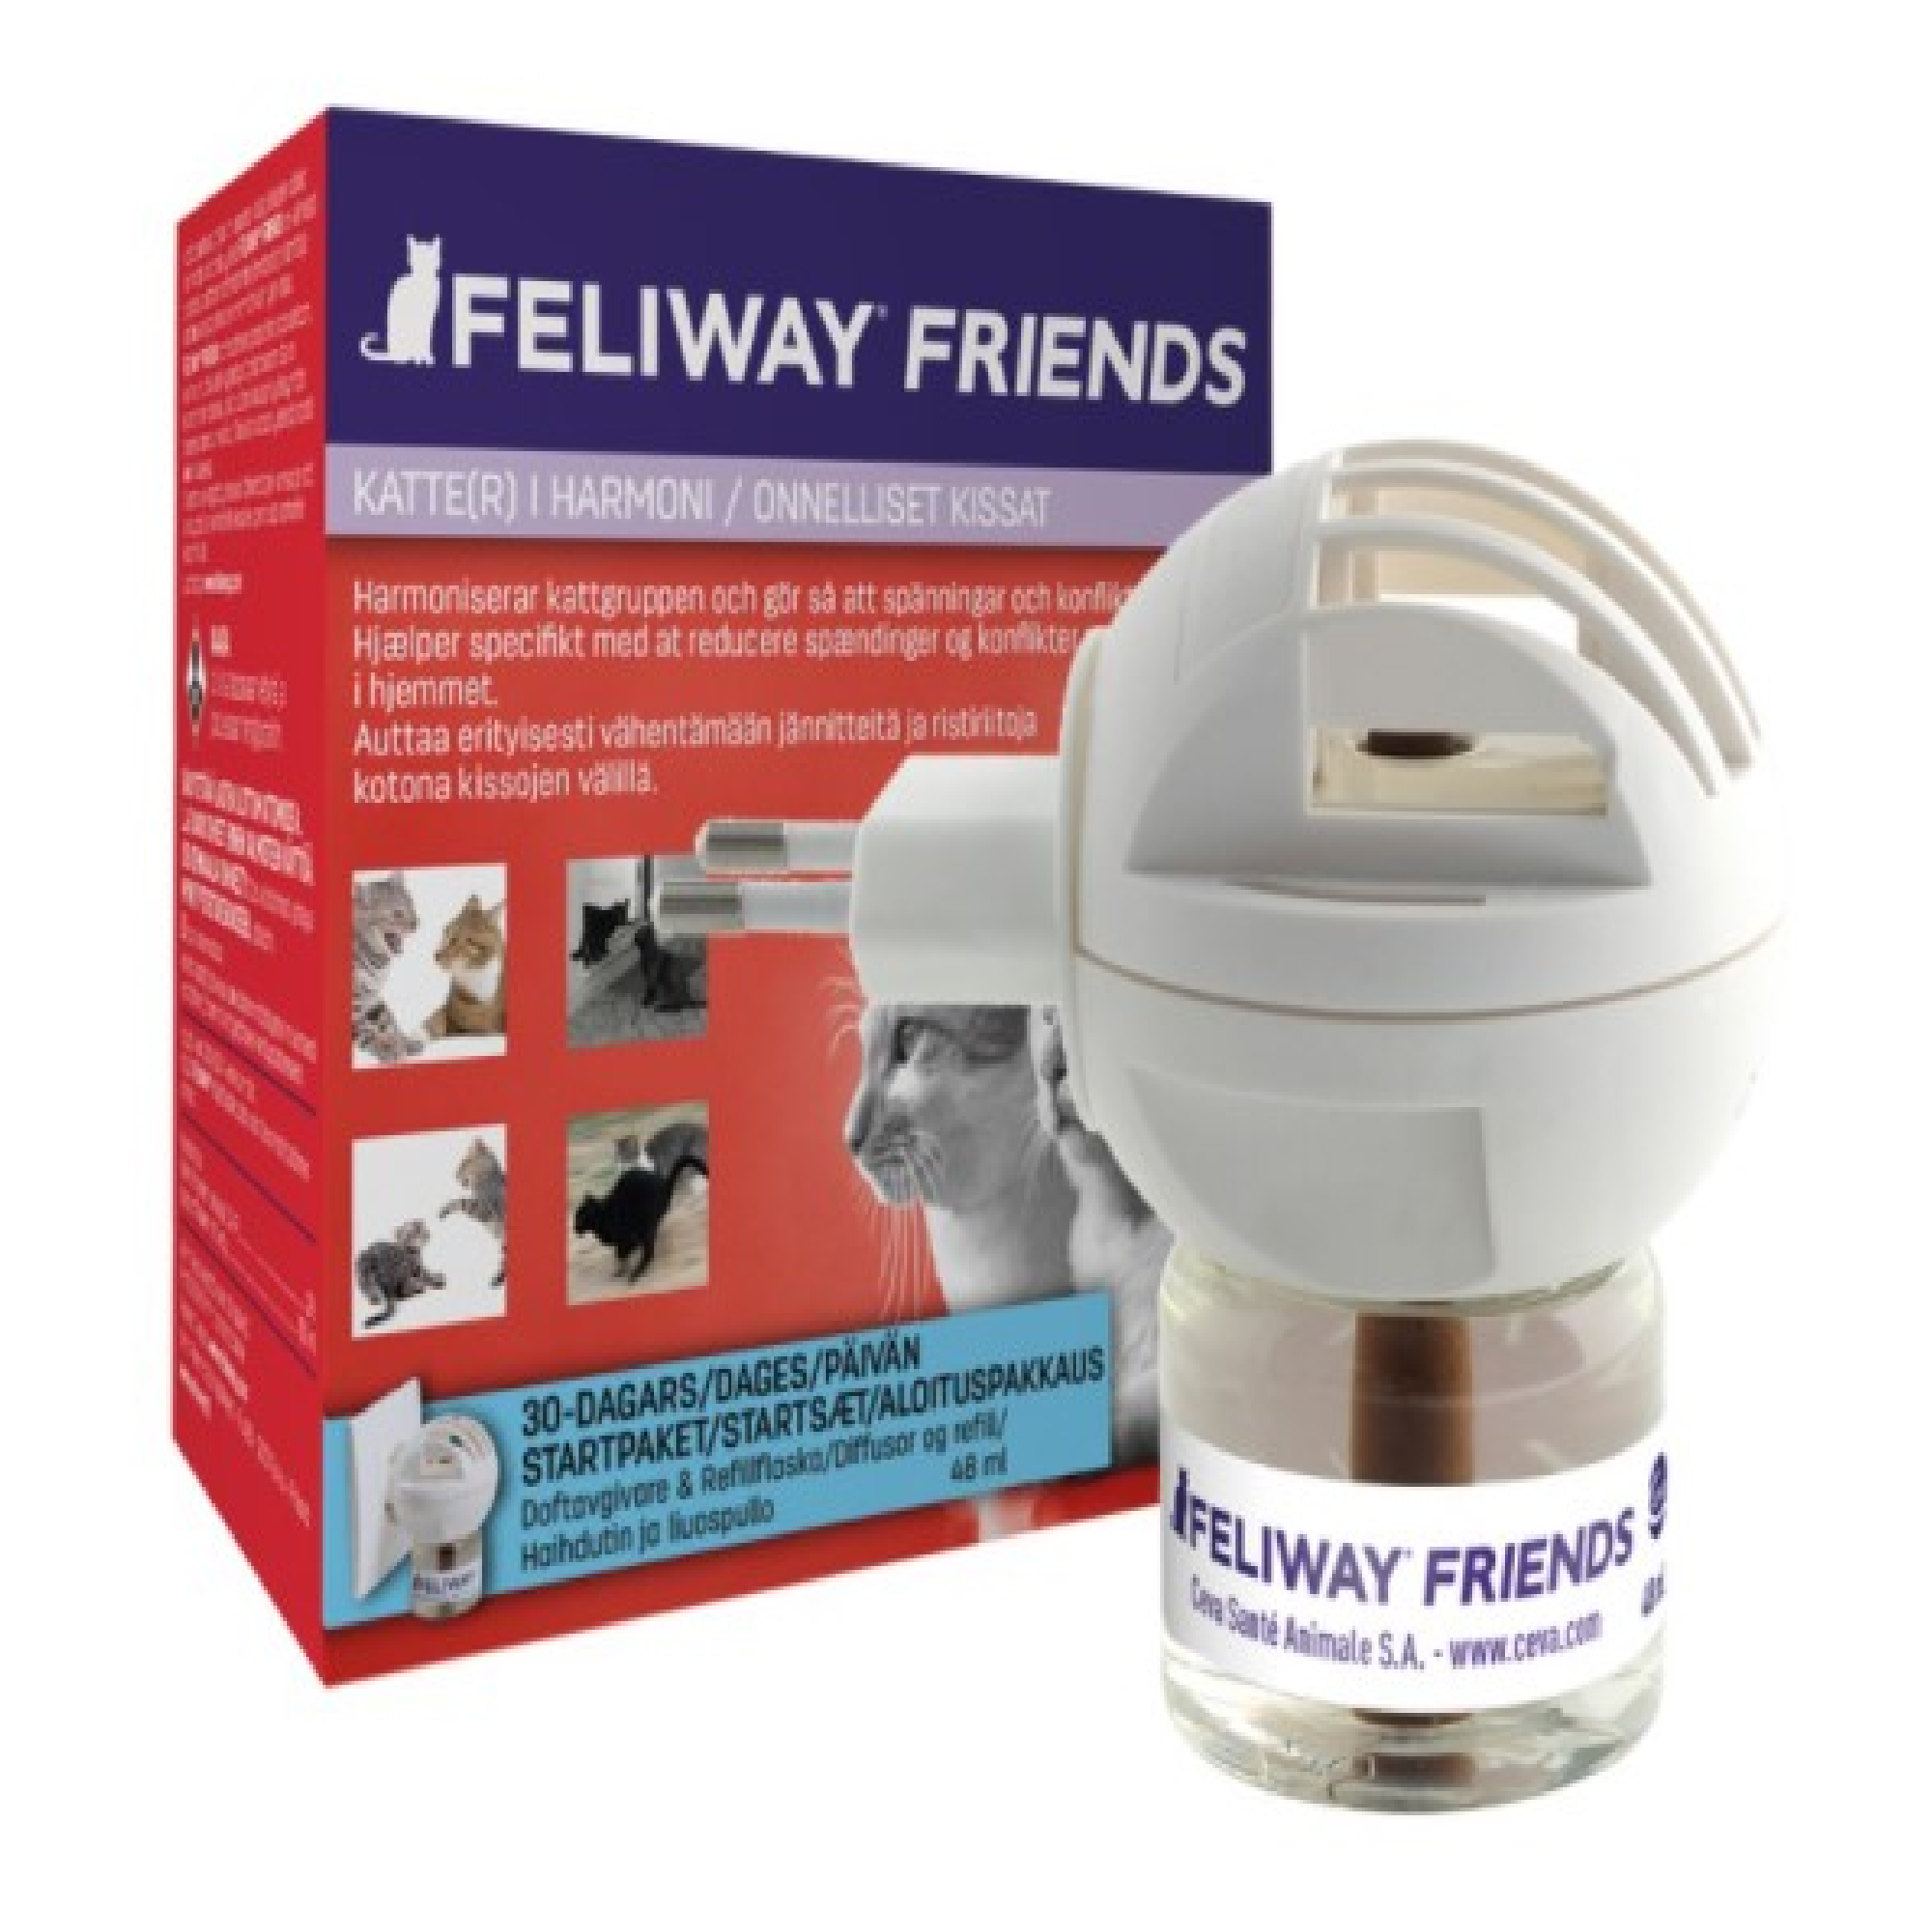 FELIWAY Friends - Startpaket